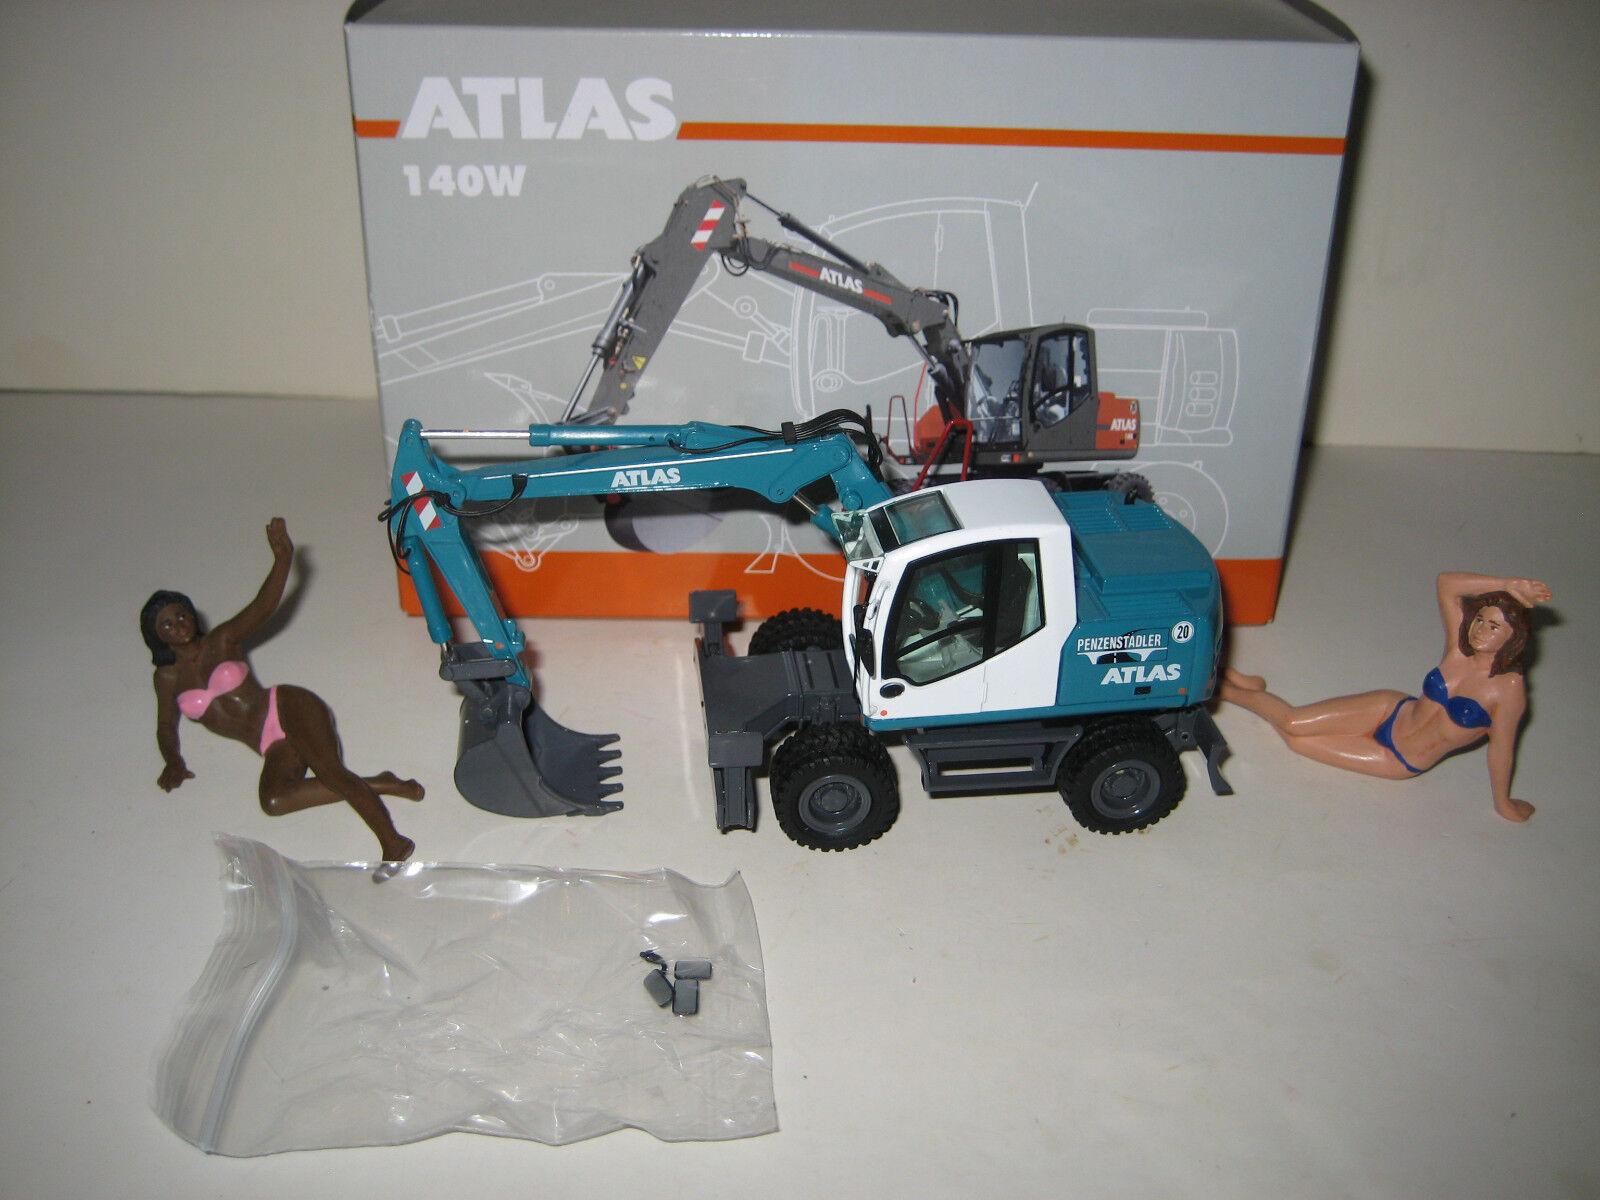 ATLAS 140 W BAGGER TIEFLÖFFEL PENZENSTADLER  837.2 NZG 1 50 OVP LIMITED EDITION  | Neuer Stil